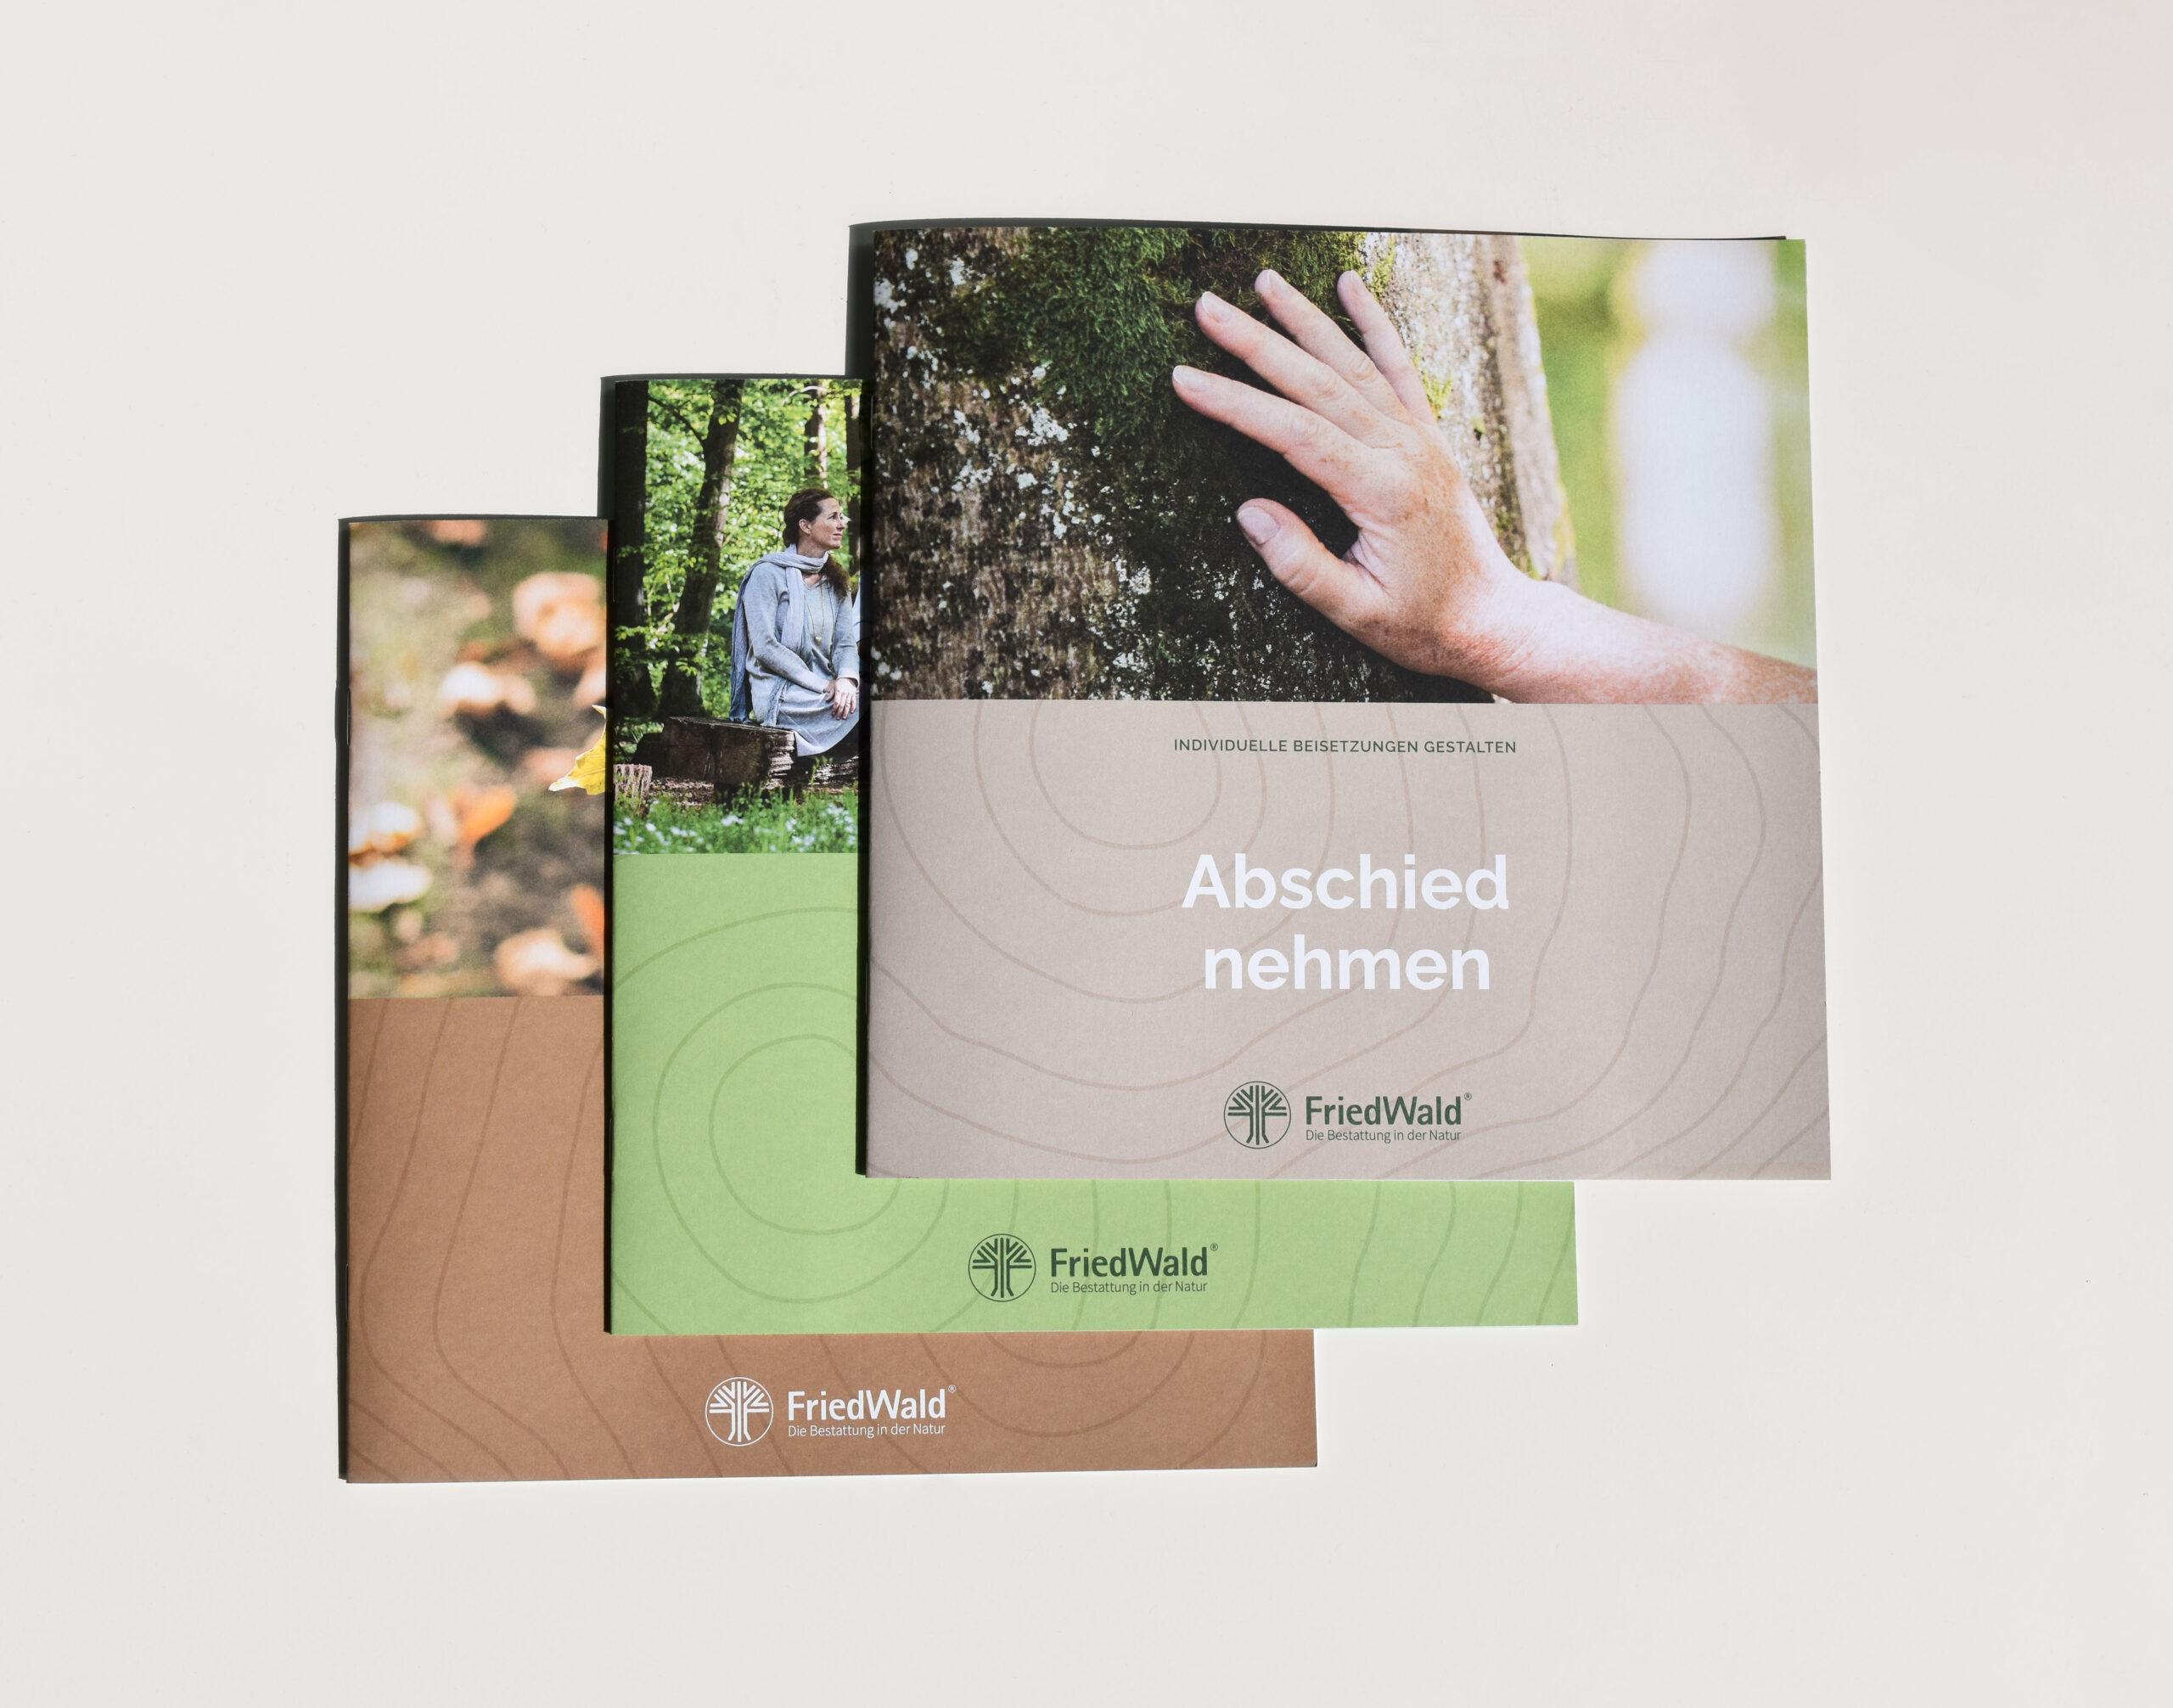 Case-Study-FriedWald-Material_Broschueren-Trio-01